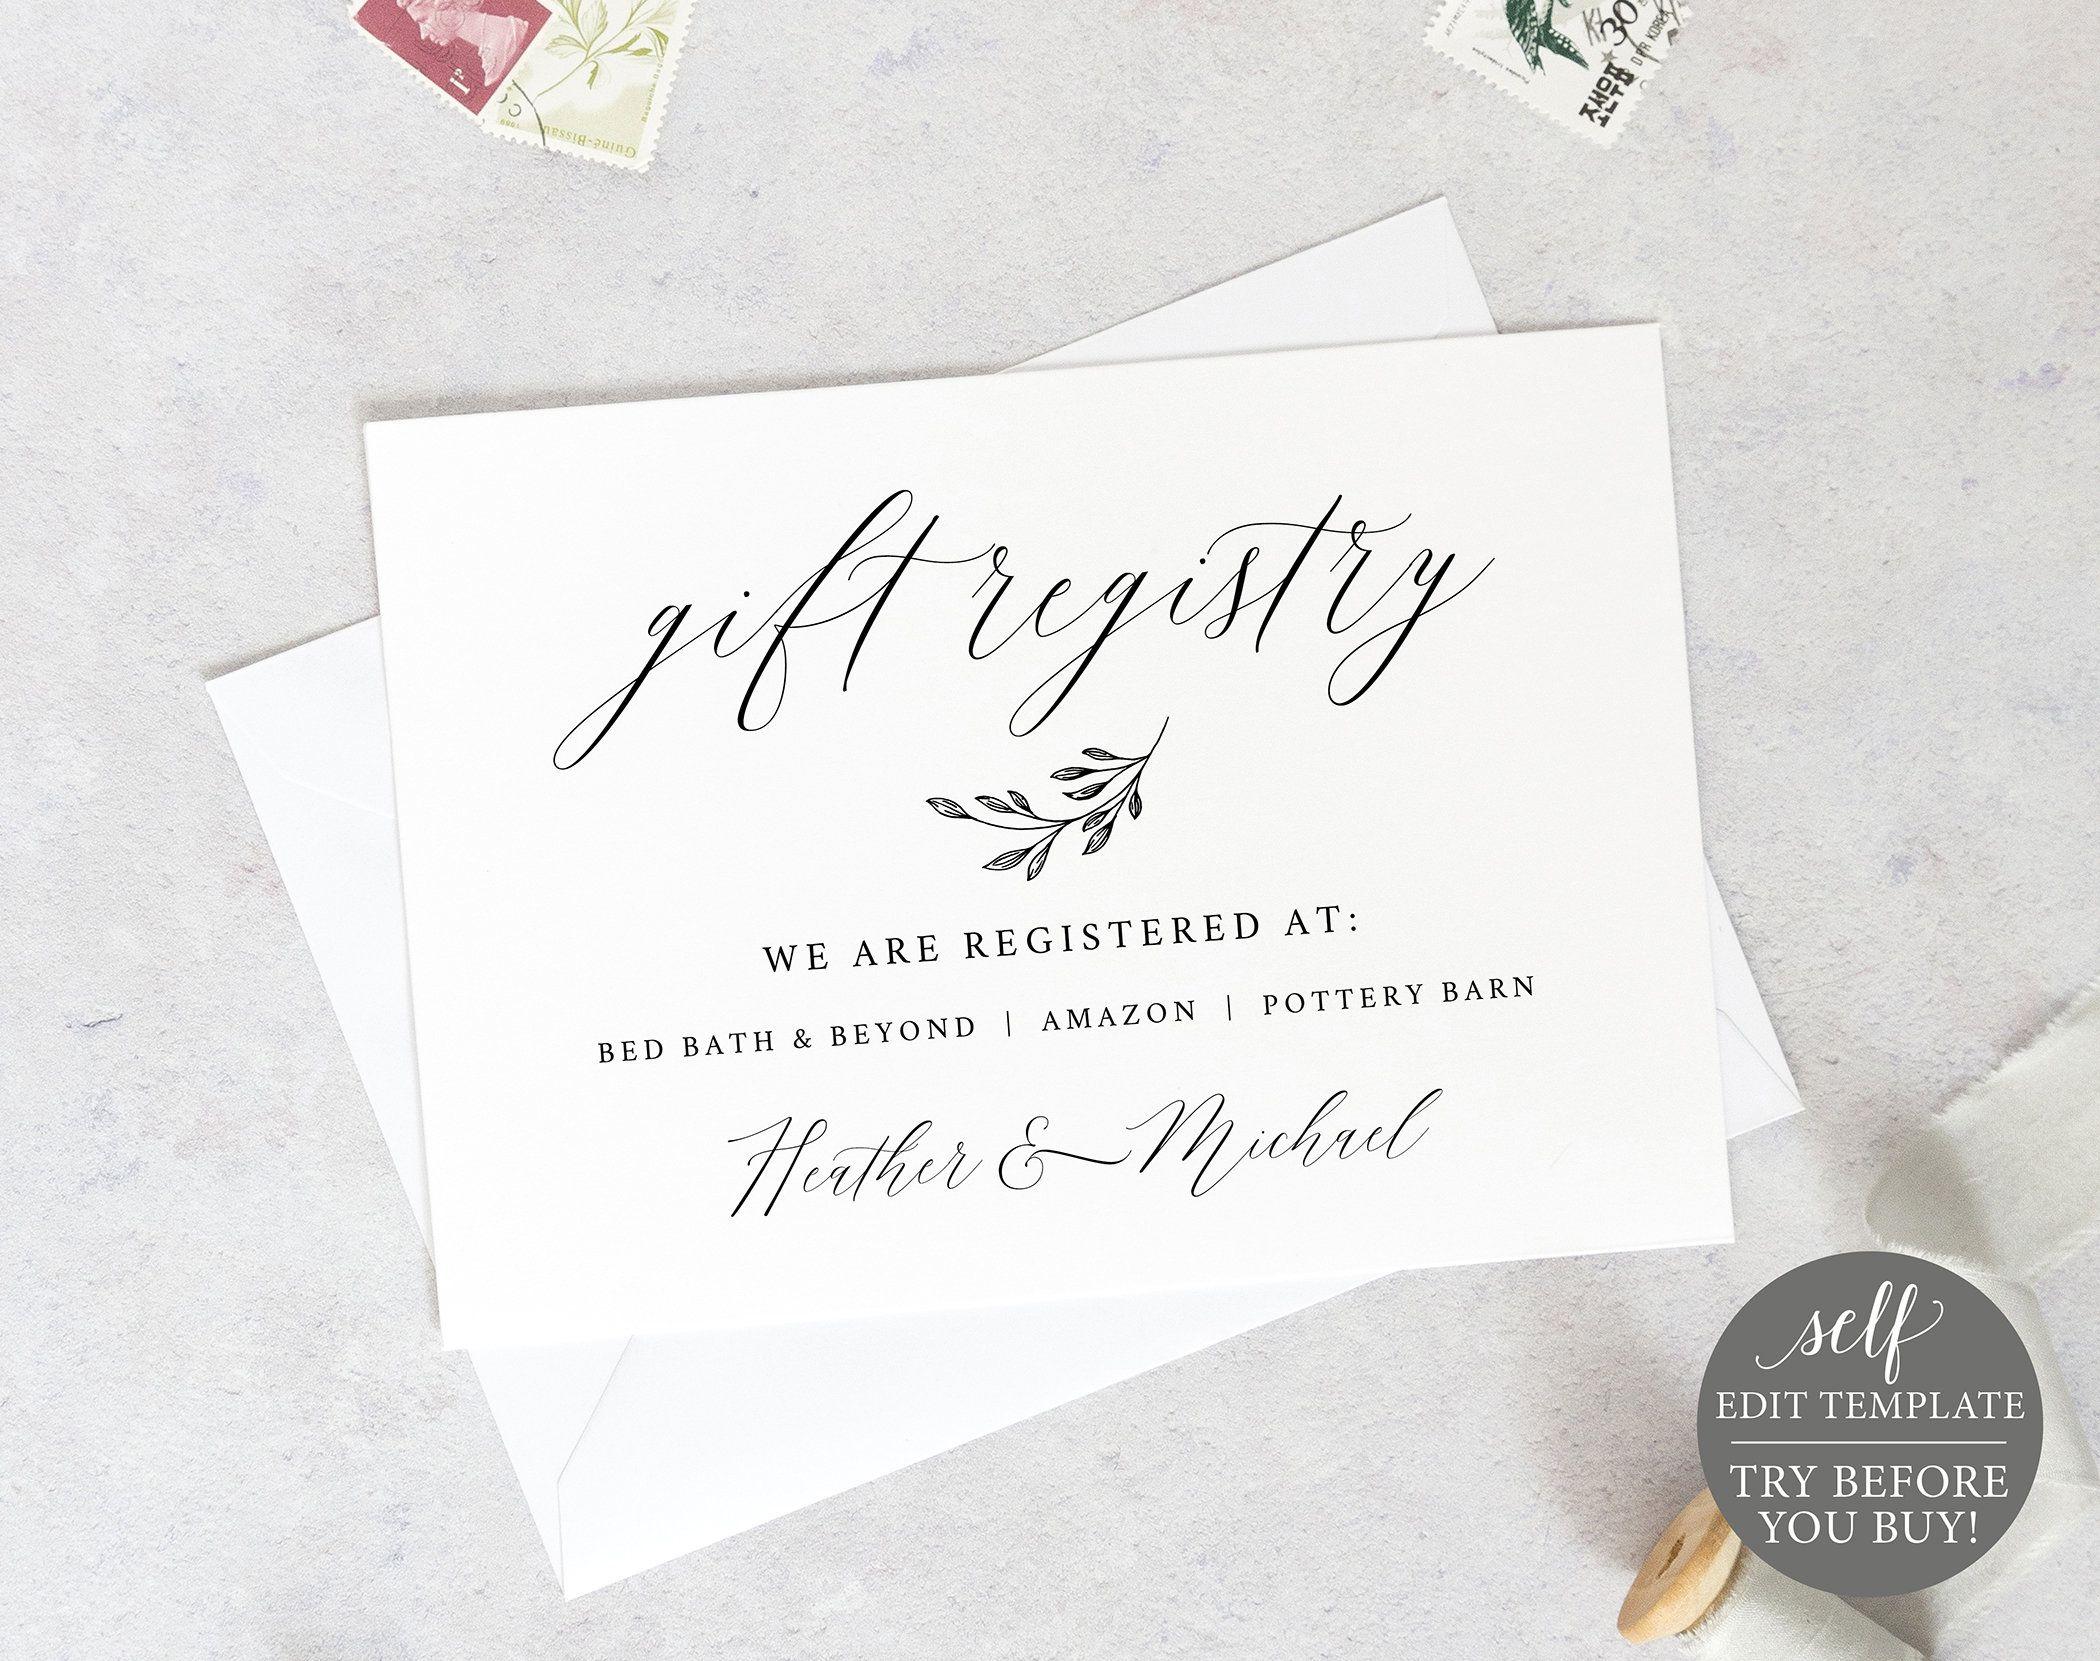 Wedding Registry Card Template Free Demo Available Printable Etsy Wedding Registry Cards Registry Cards Gift Registry Cards